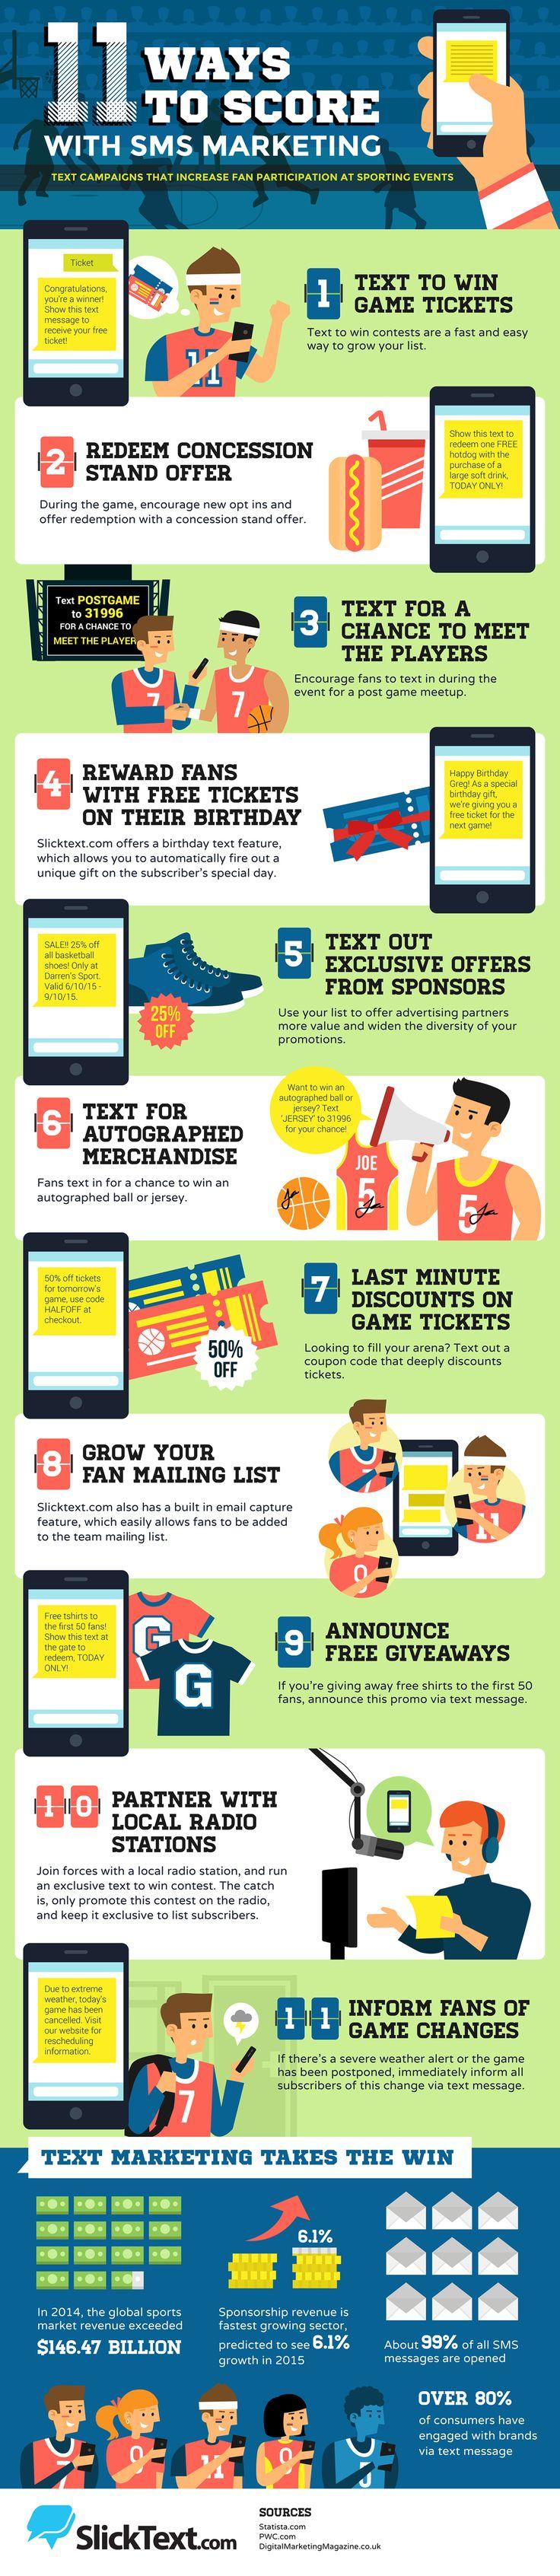 11 Ways to Score with SMS Marketing #infographic #SMSMarketing #Marketing